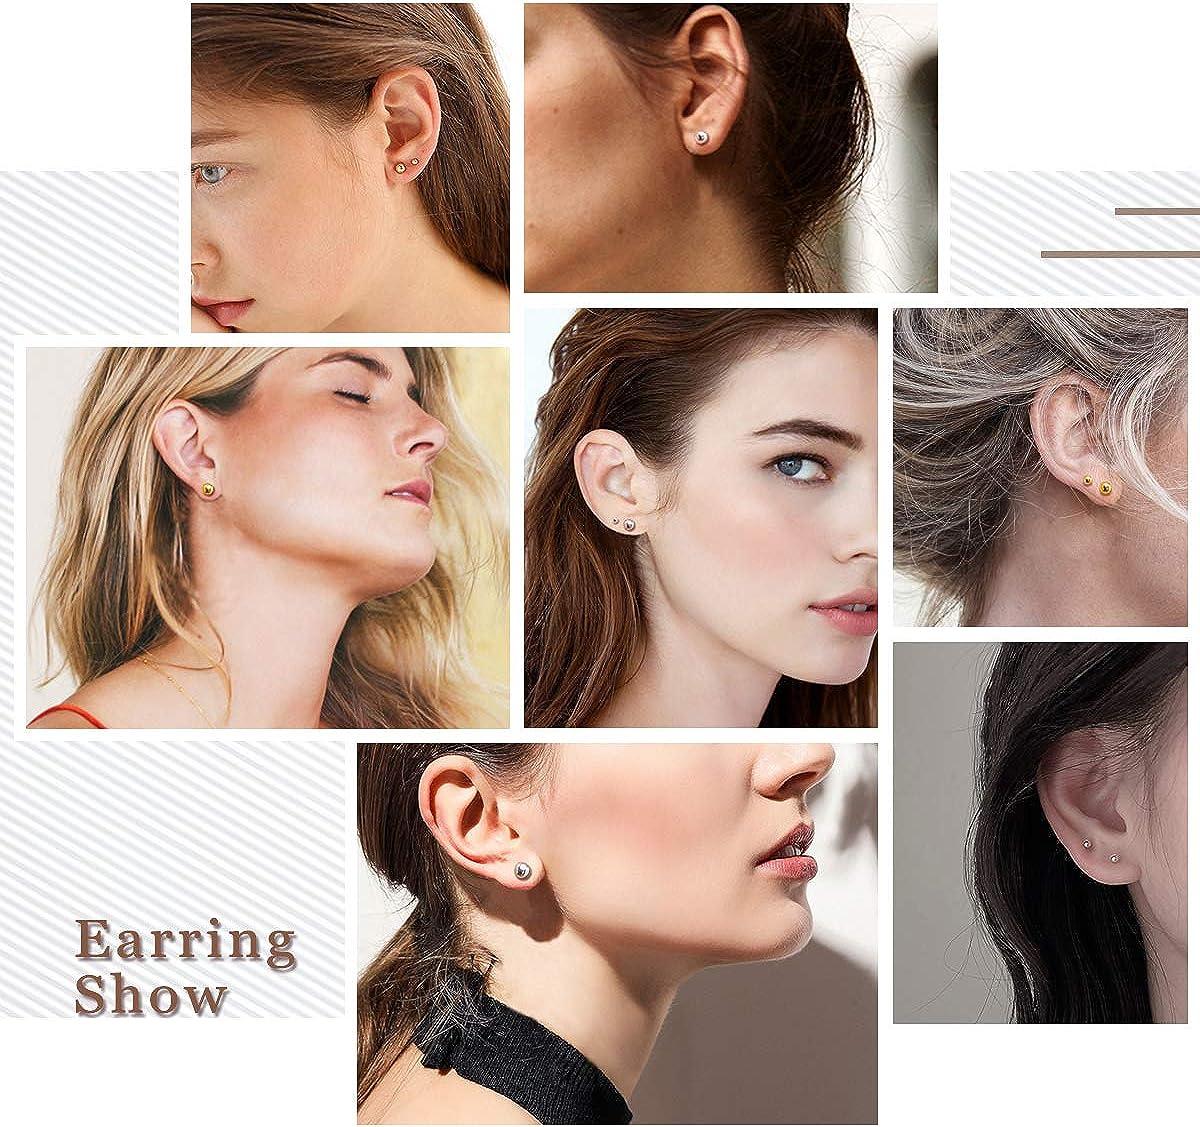 925 Sterling Silver Ball Stud Earrings for Women Men Girls Multiple Piercing Earring Set Round Tiny Large Studs for Sensitive Ear Hypoallergenic 3 pair, 3,5,7mm